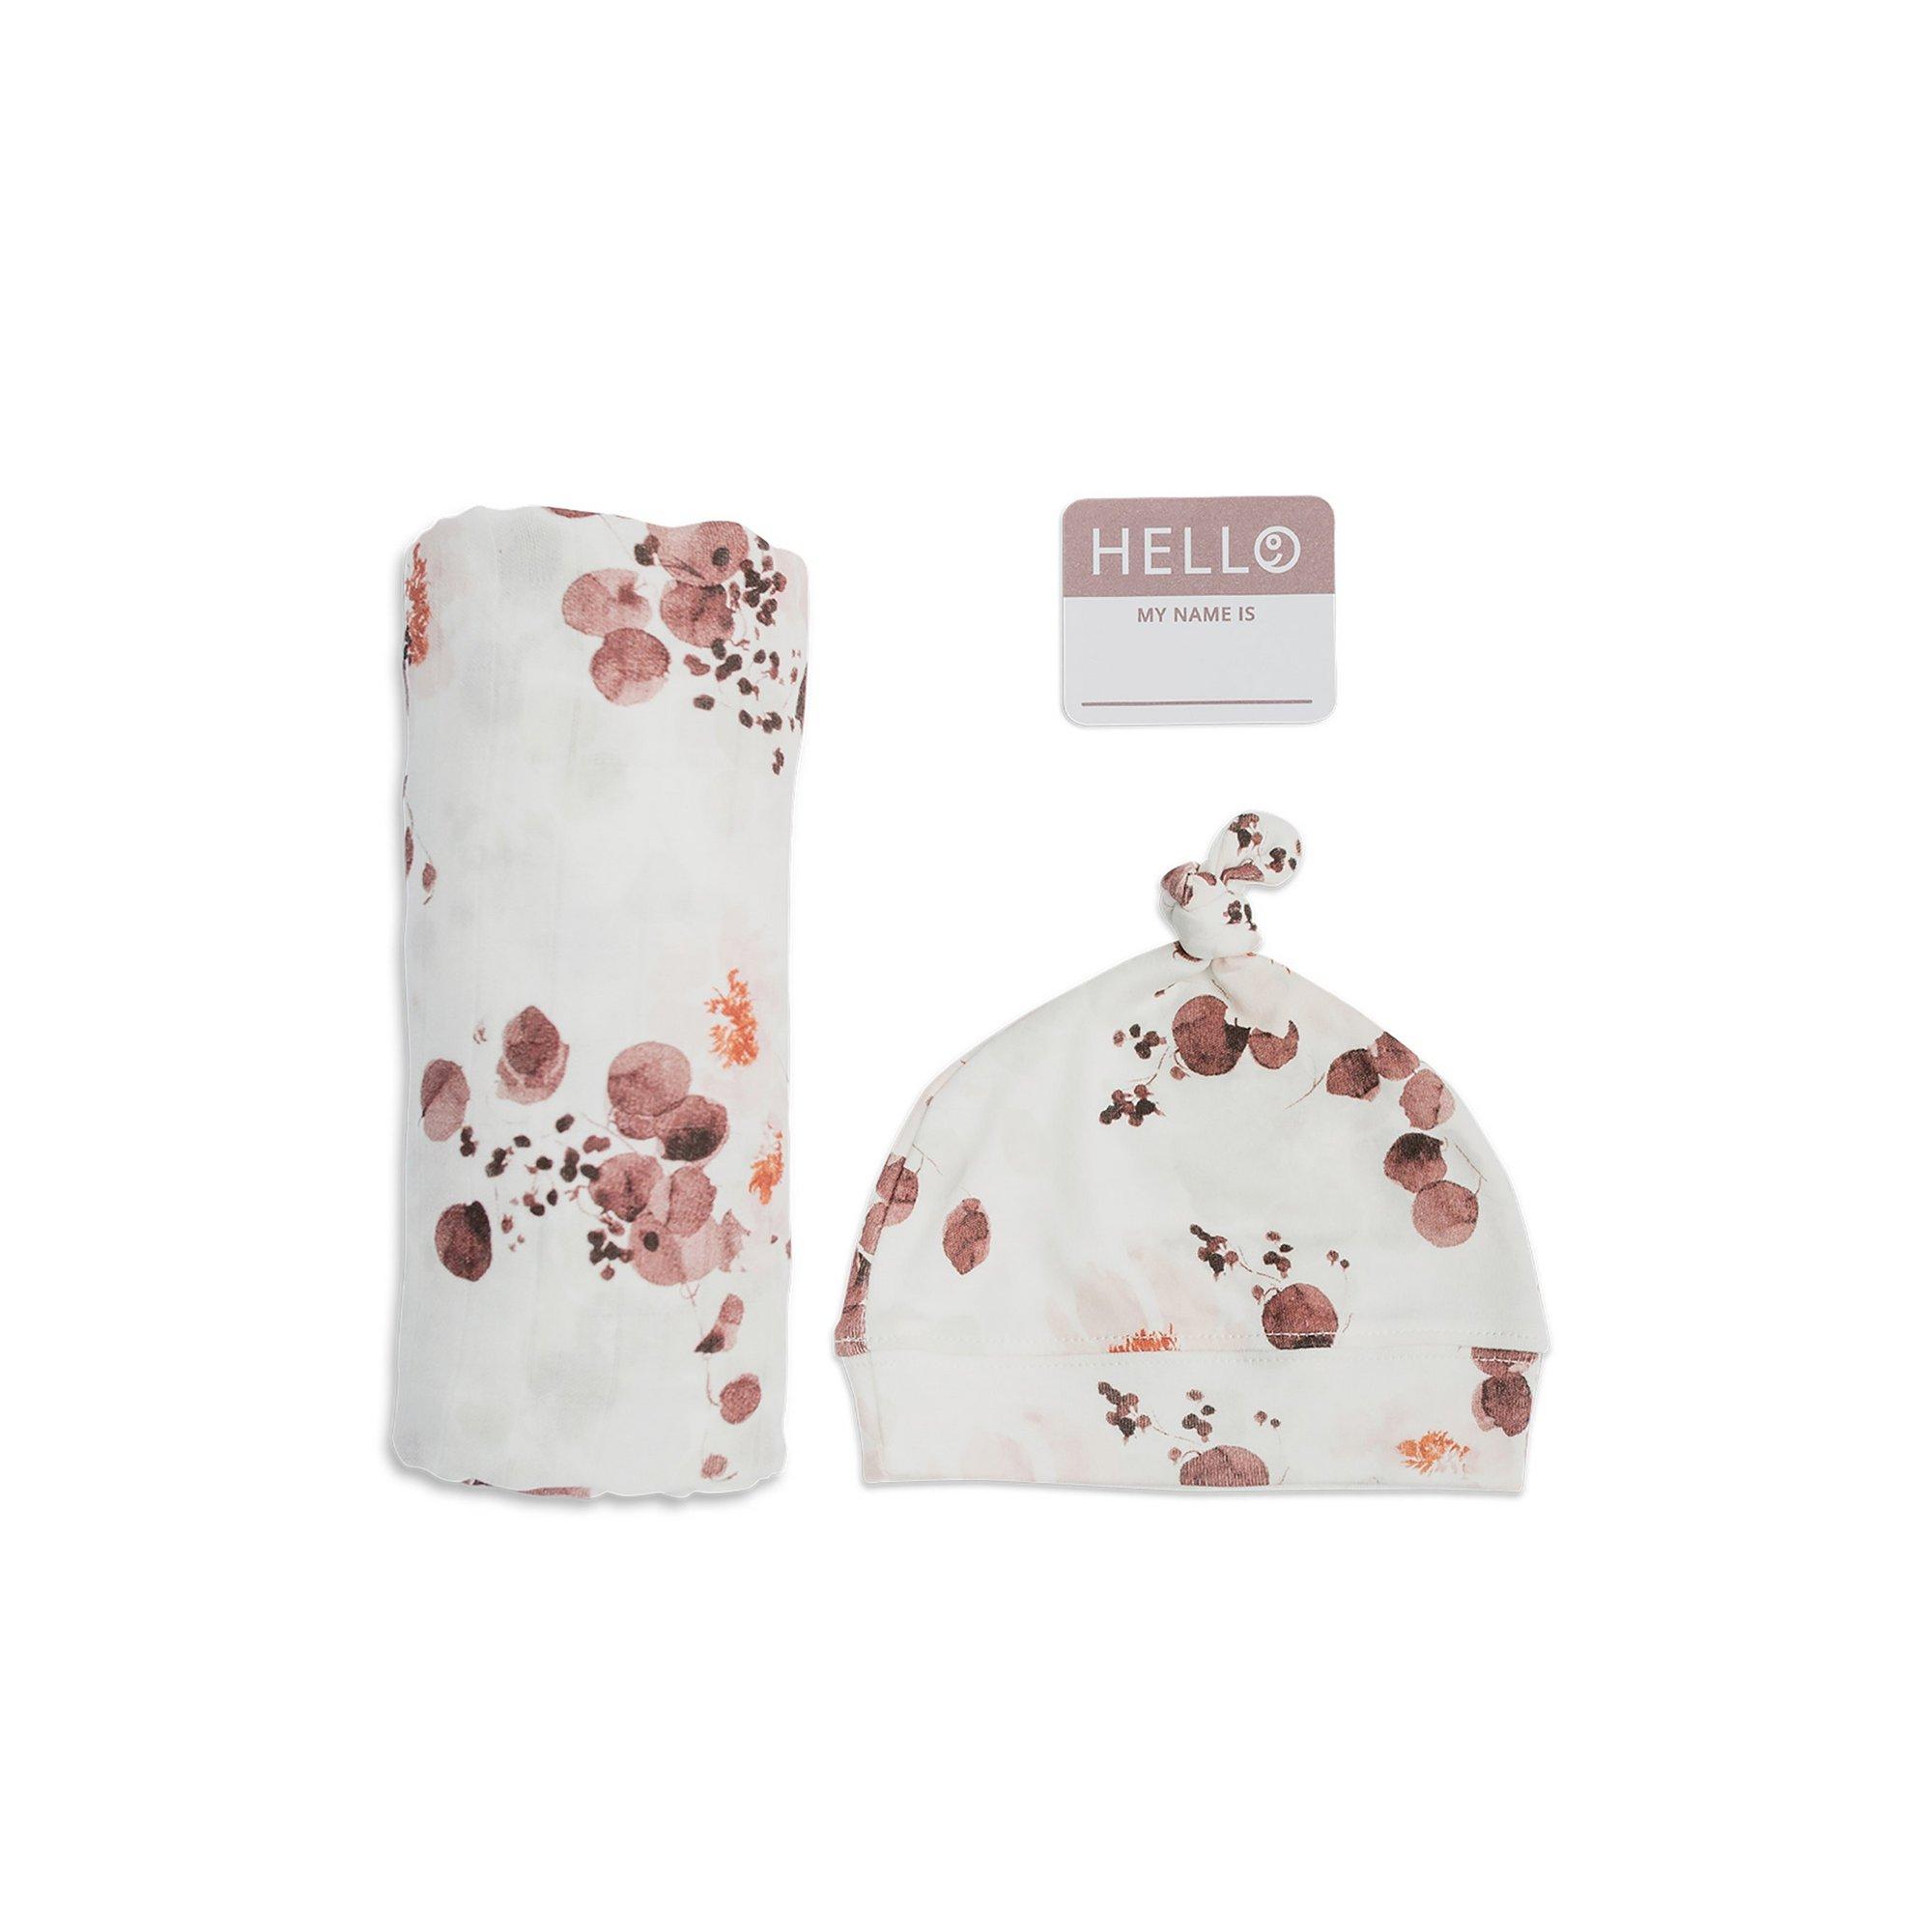 Image of Lulujo Newborn Hat and Swaddle Set - Eucalyptus